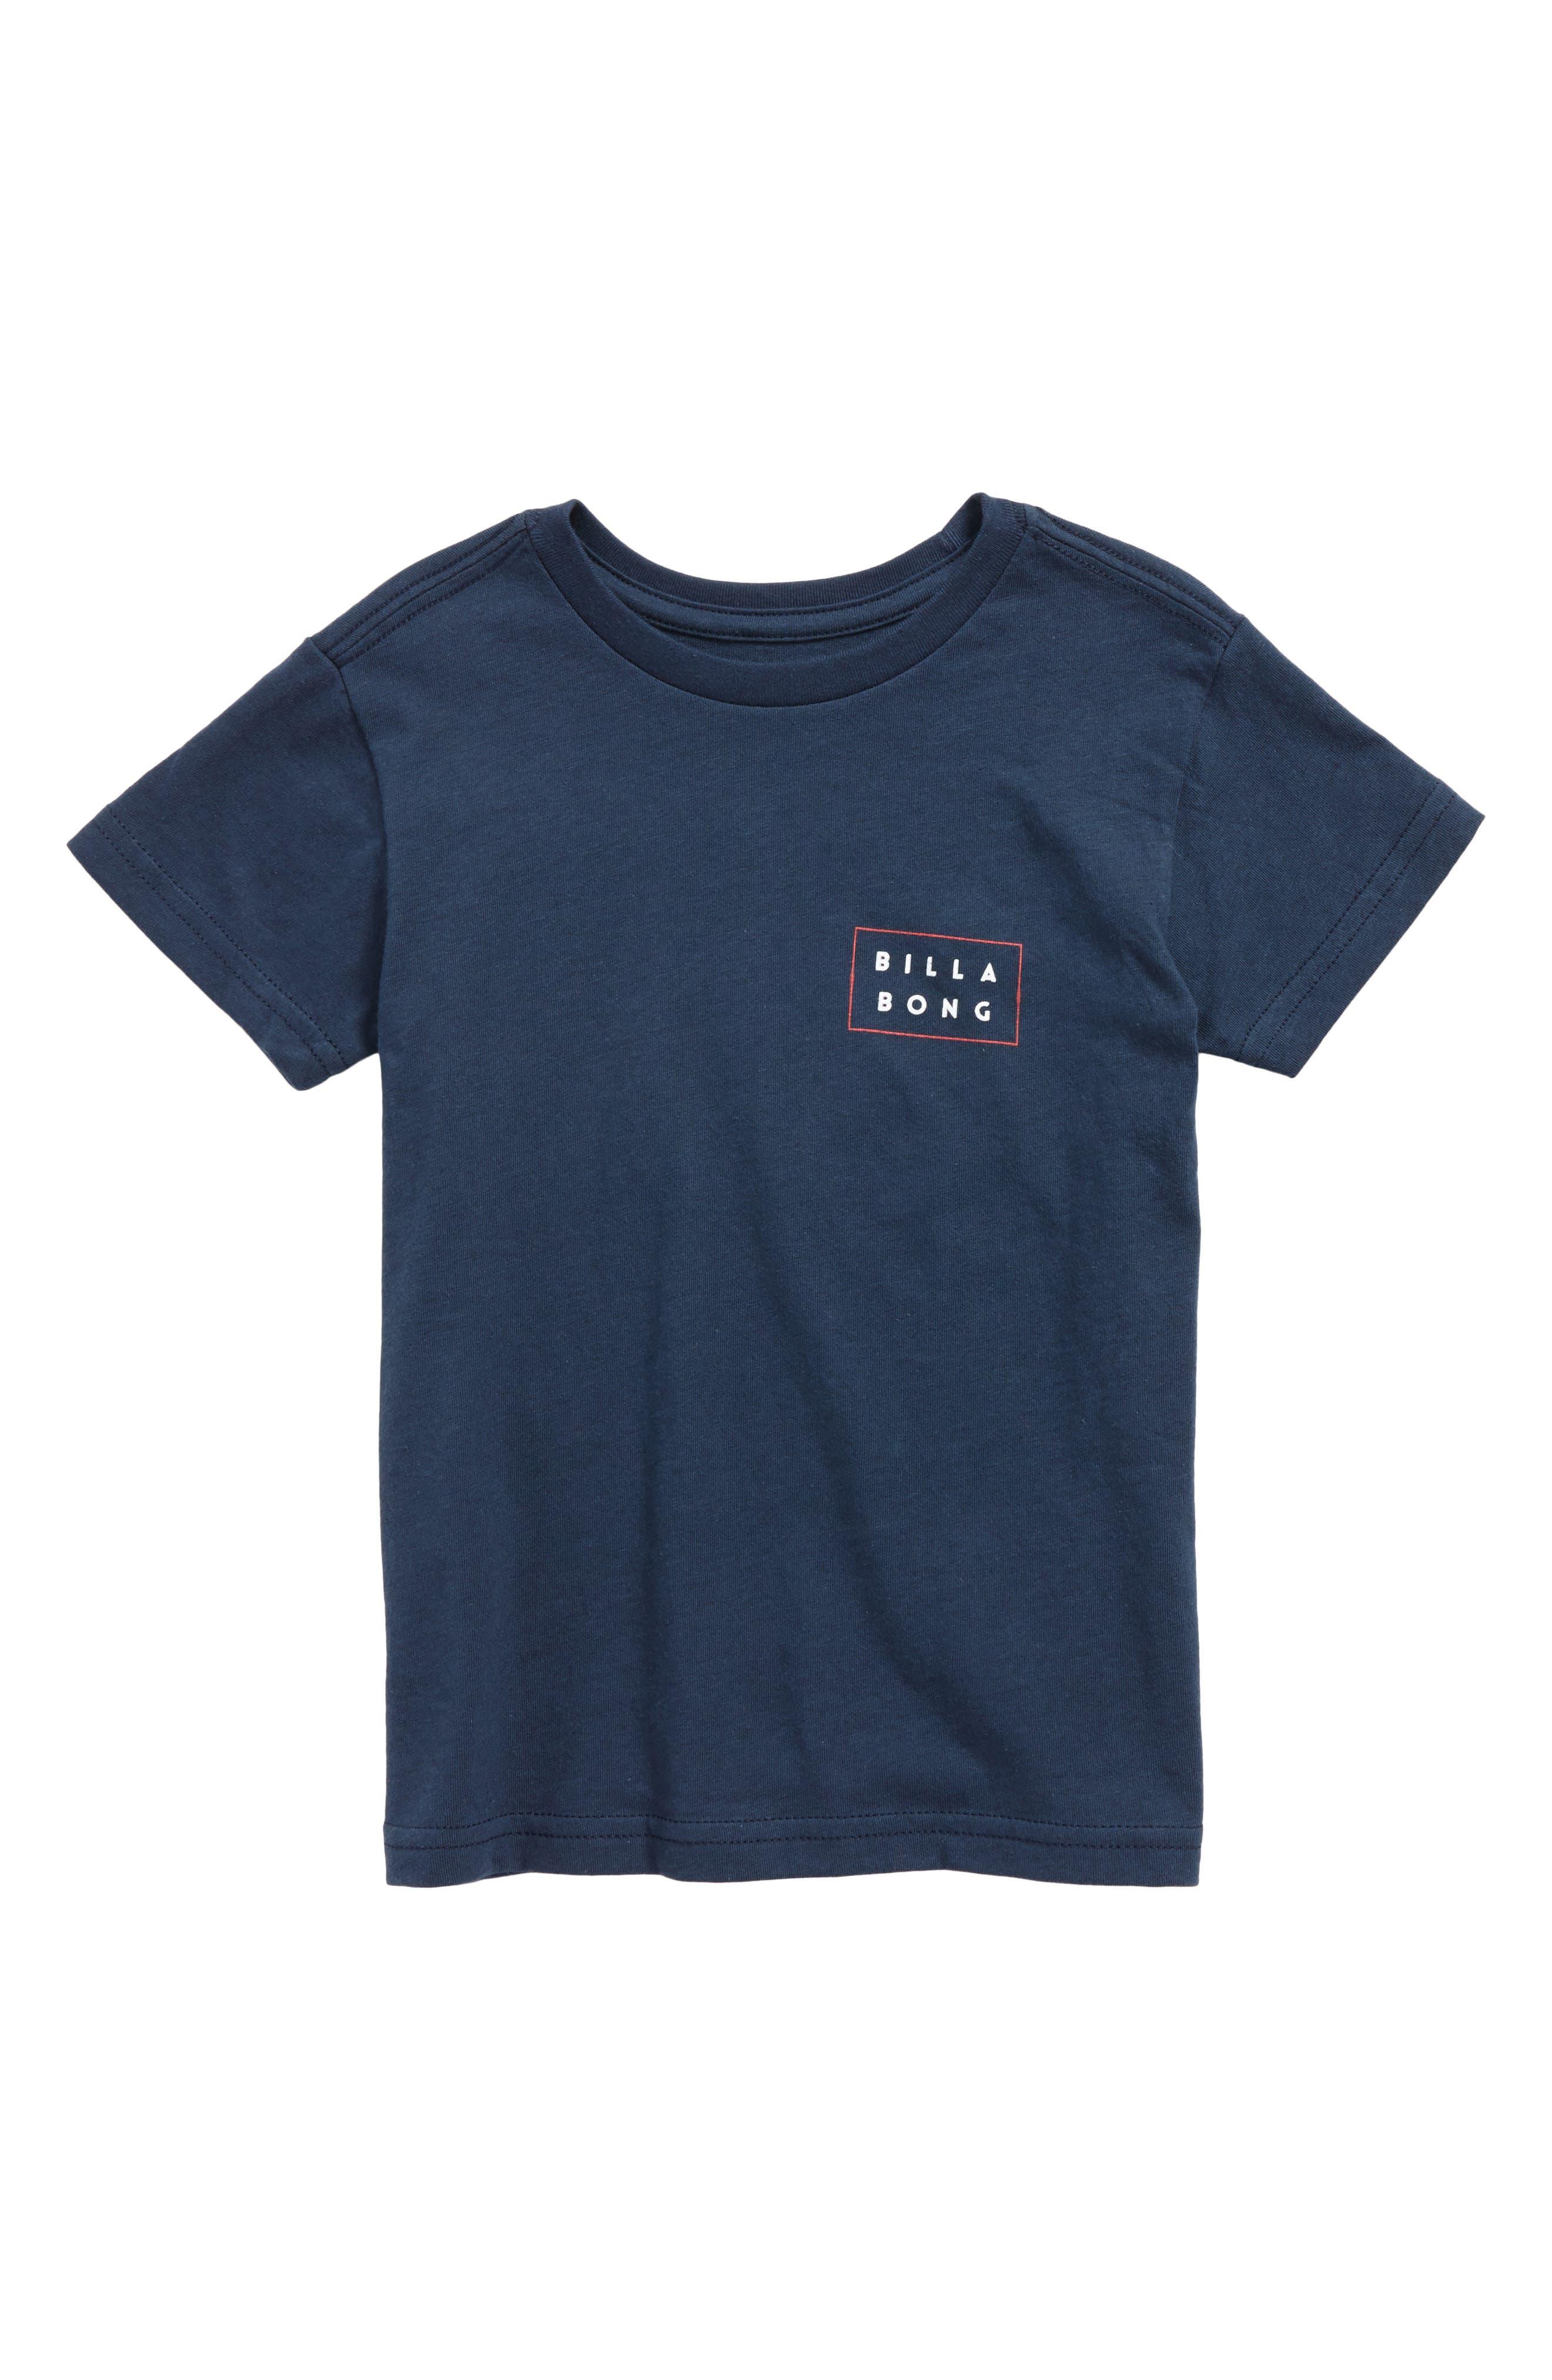 Fill Die Cut T-Shirt,                         Main,                         color, Navy